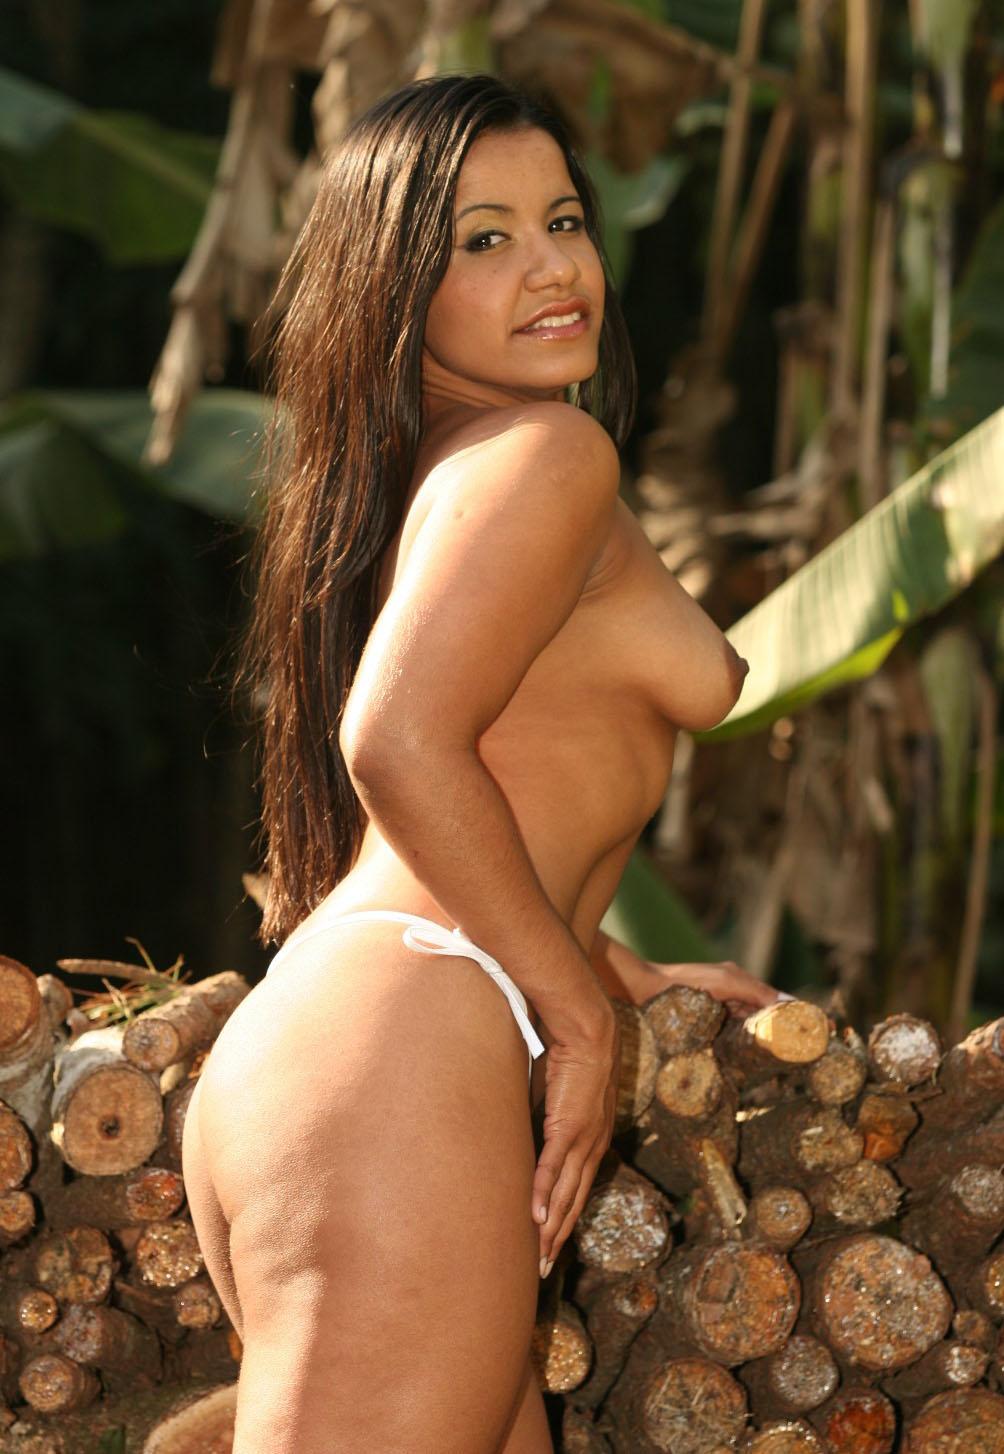 Nri Desi Aunty Naked Pussy Porn Photoshoot Outdoor Honeymoon 4